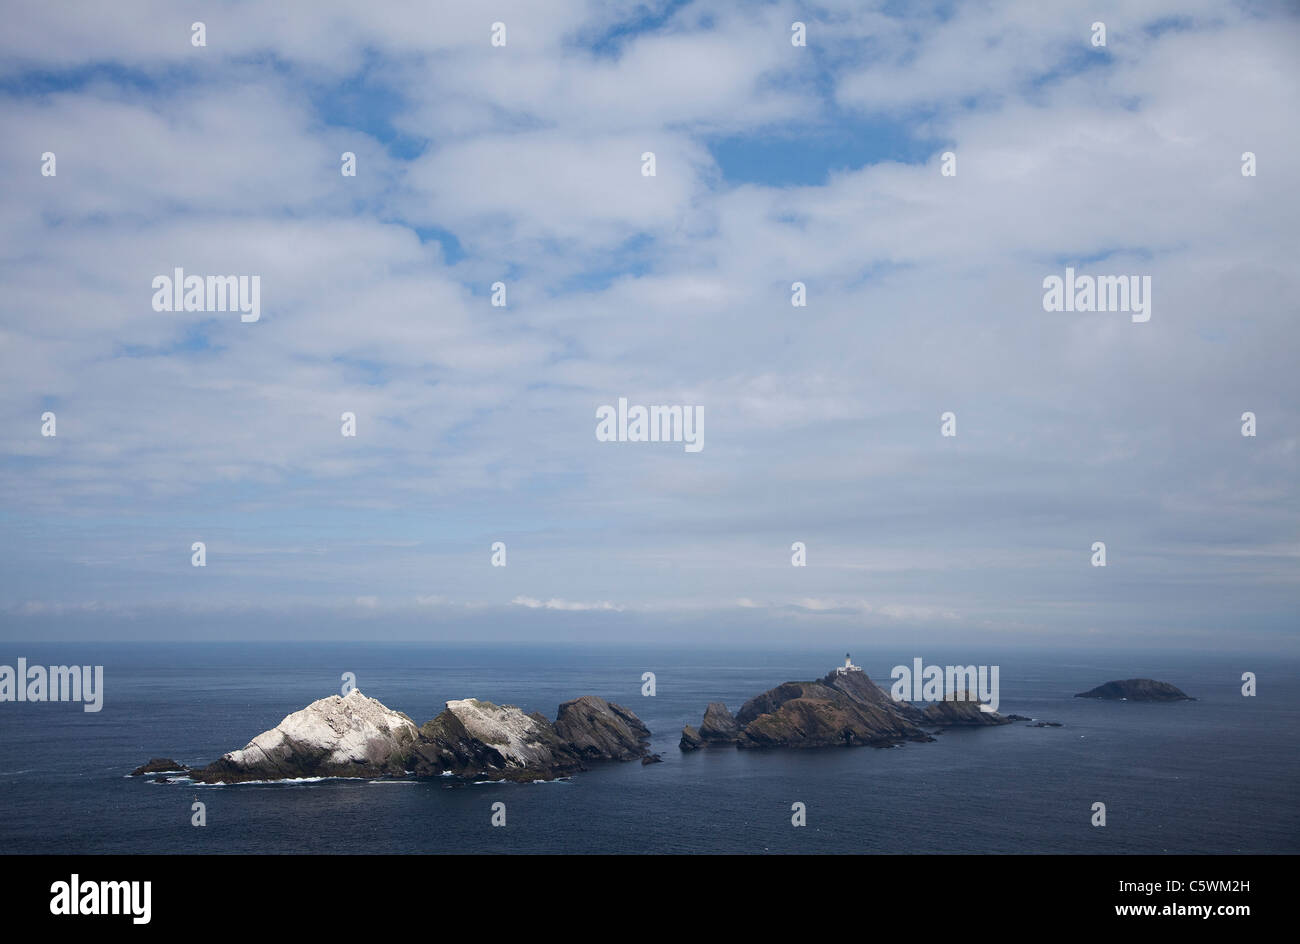 Northern Gannet (Sula bassana, Morus bassanus). Breeding colony on Muckle Flugga, the UKs most northerly point - Stock Image